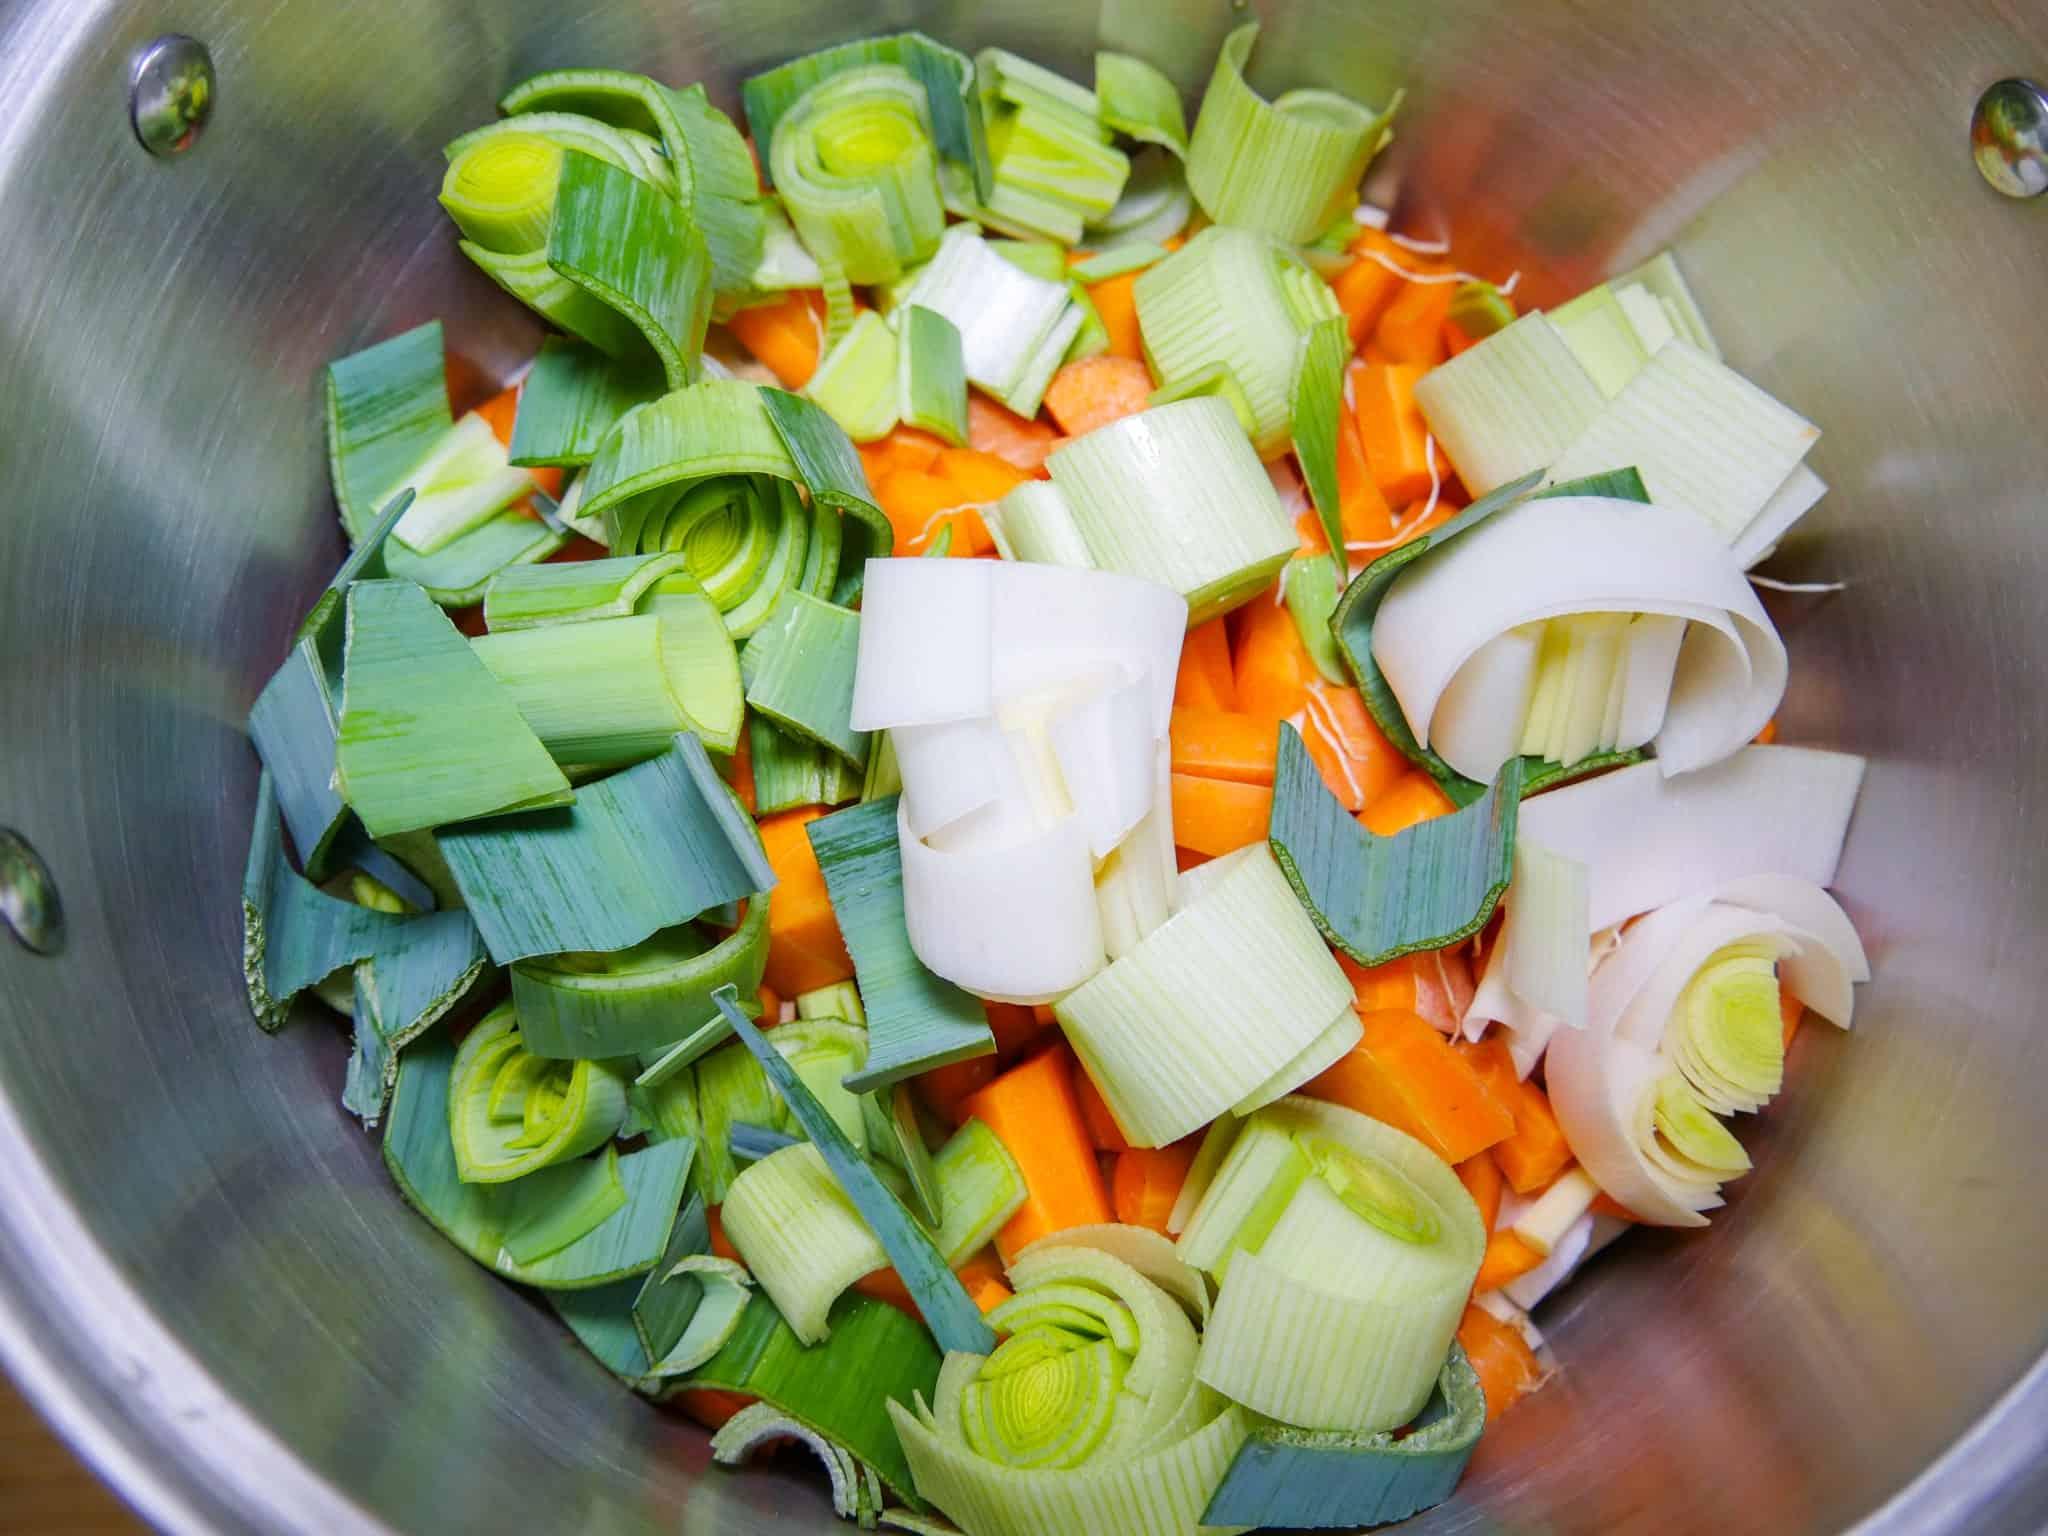 selbstgemachte Gemüsebrühe kochen